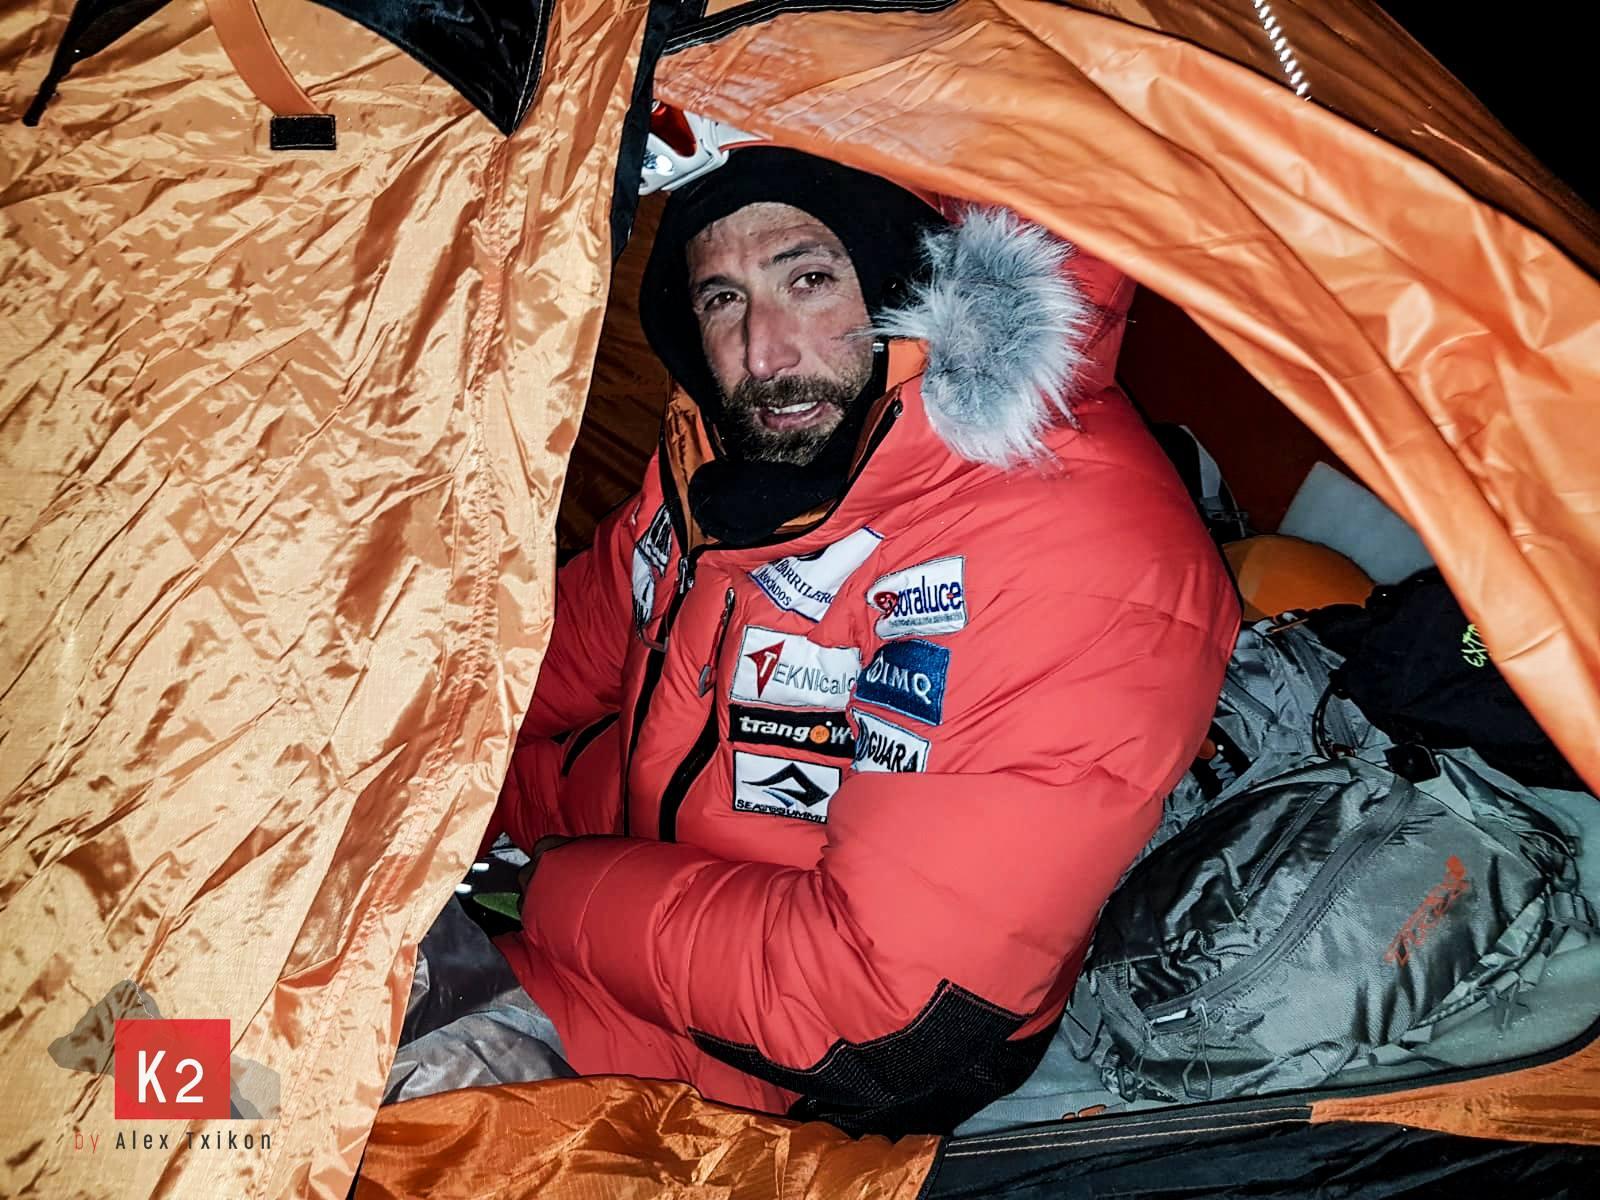 alpinismo, k2, invernale, alex txikon,